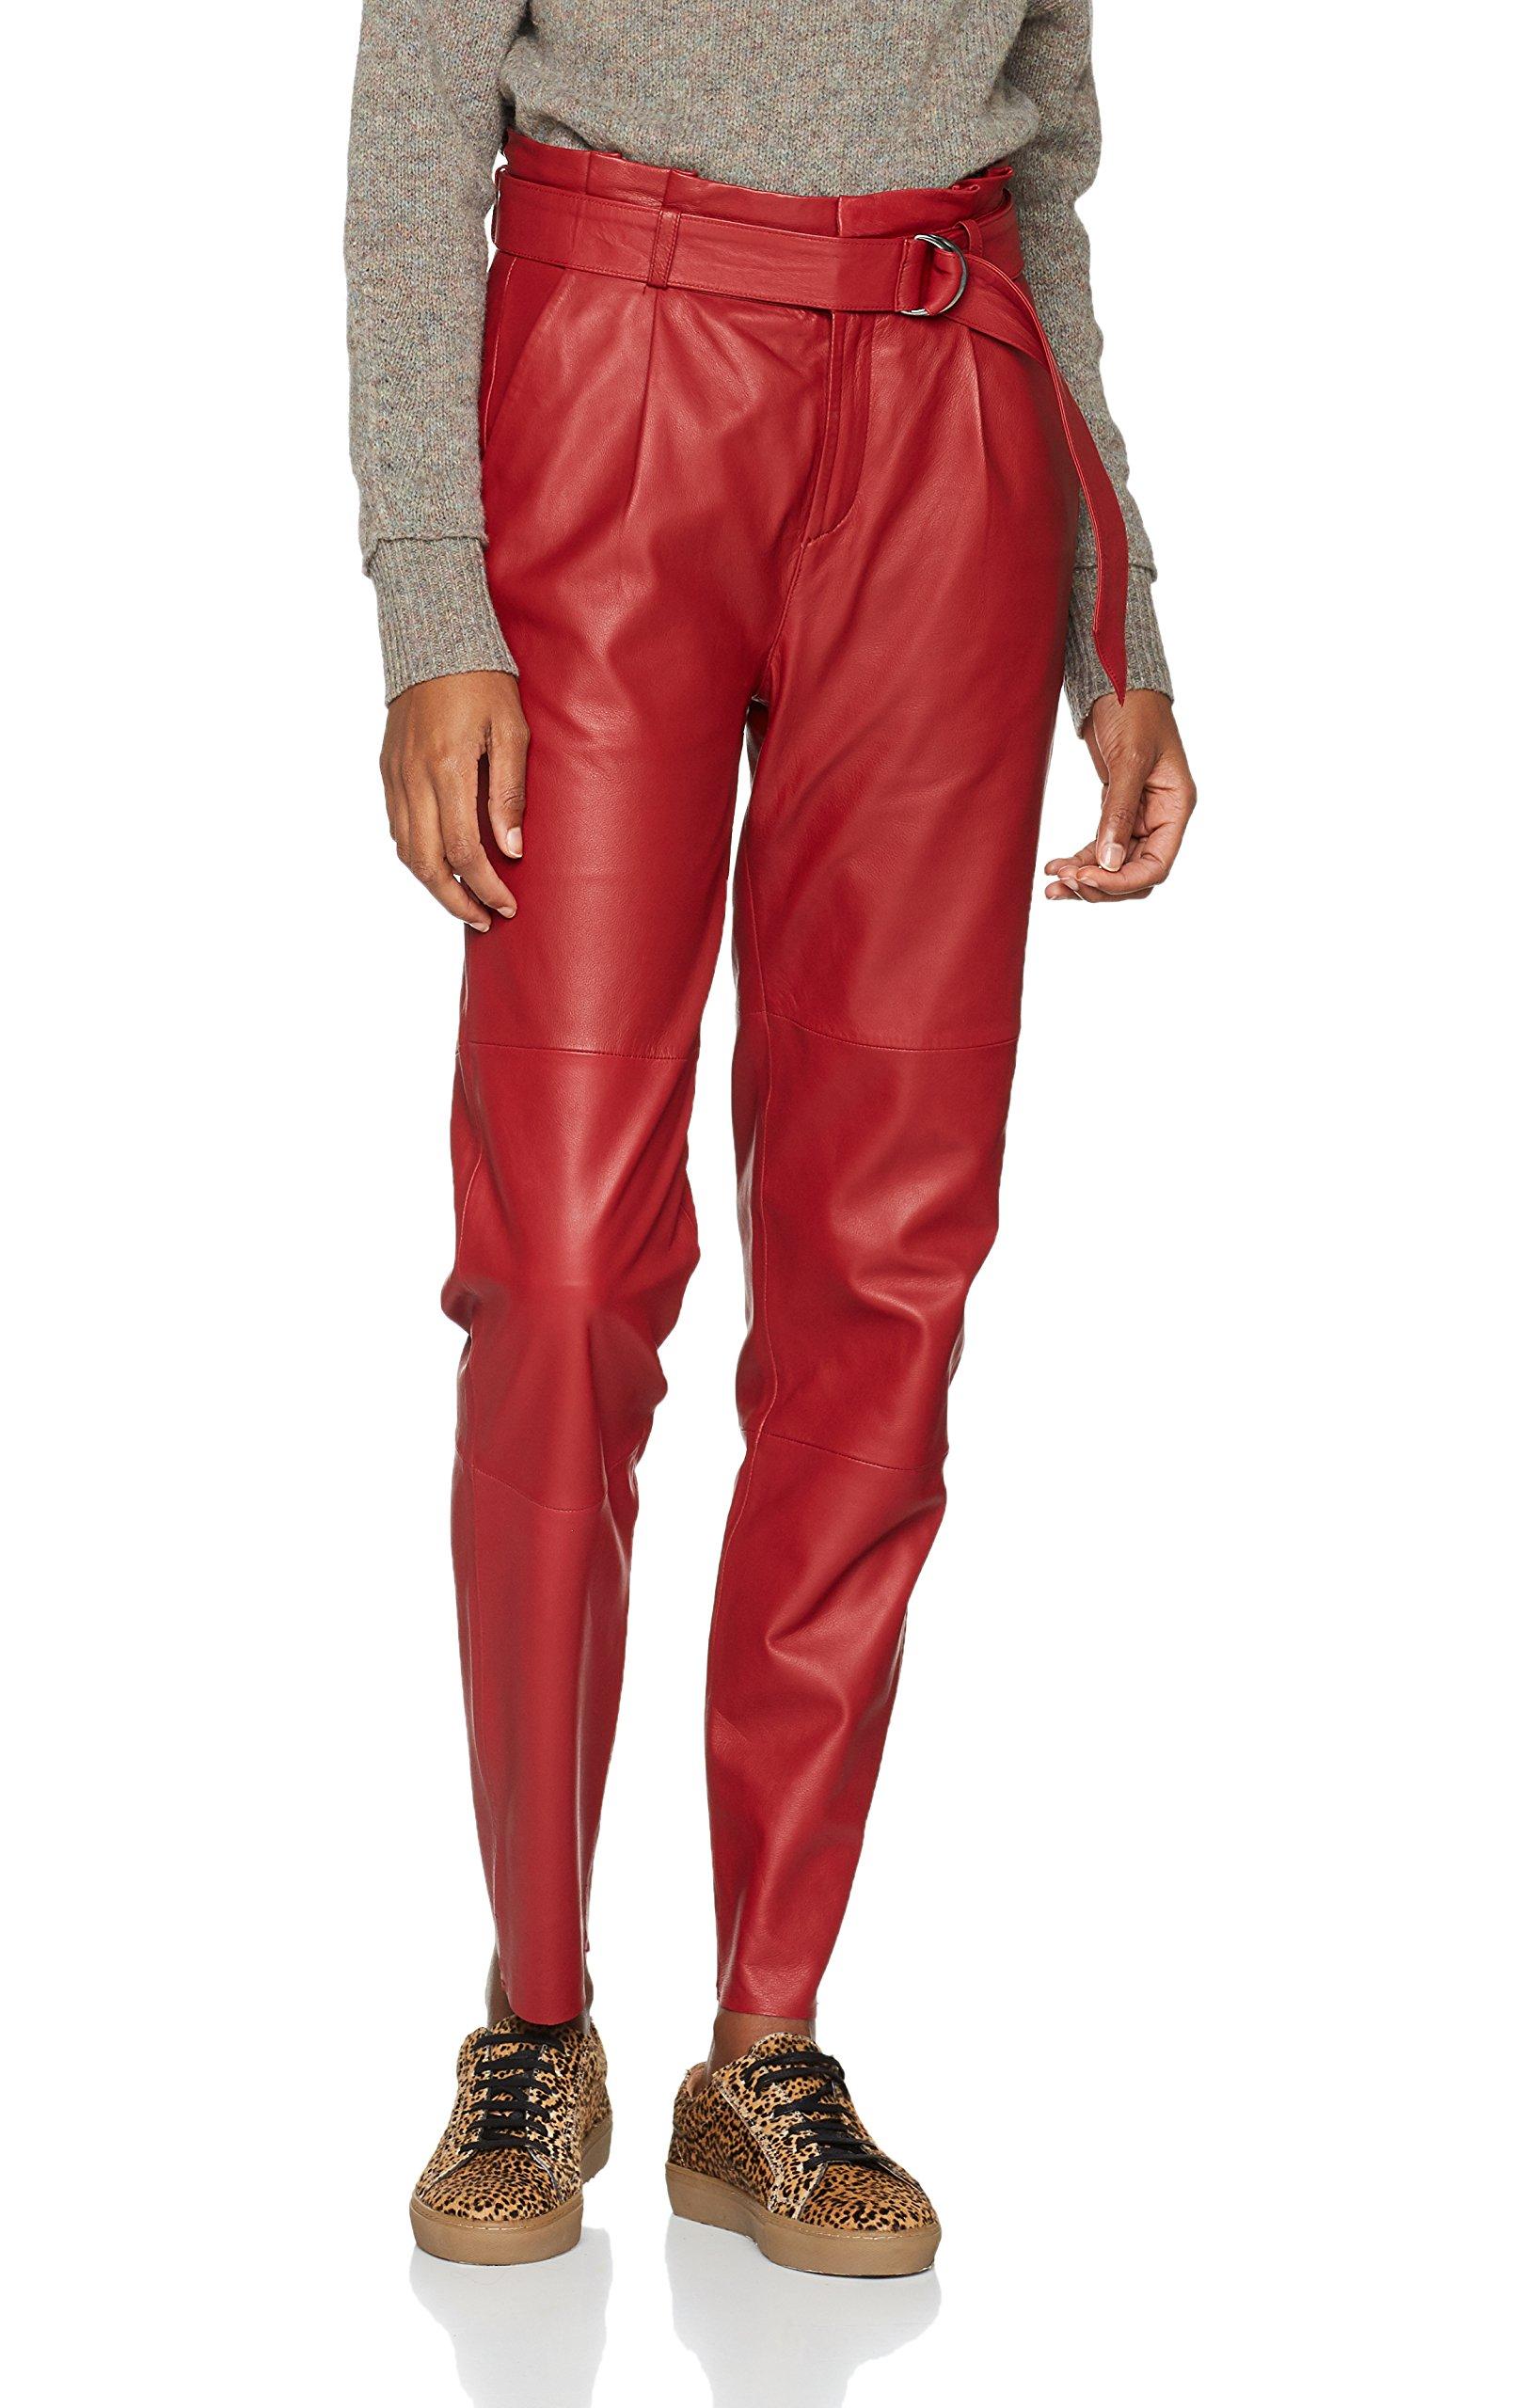 Pants l33 Ma17 90314W27 Gestuz PantalonRougemerlot Femme Beth E2WHID9